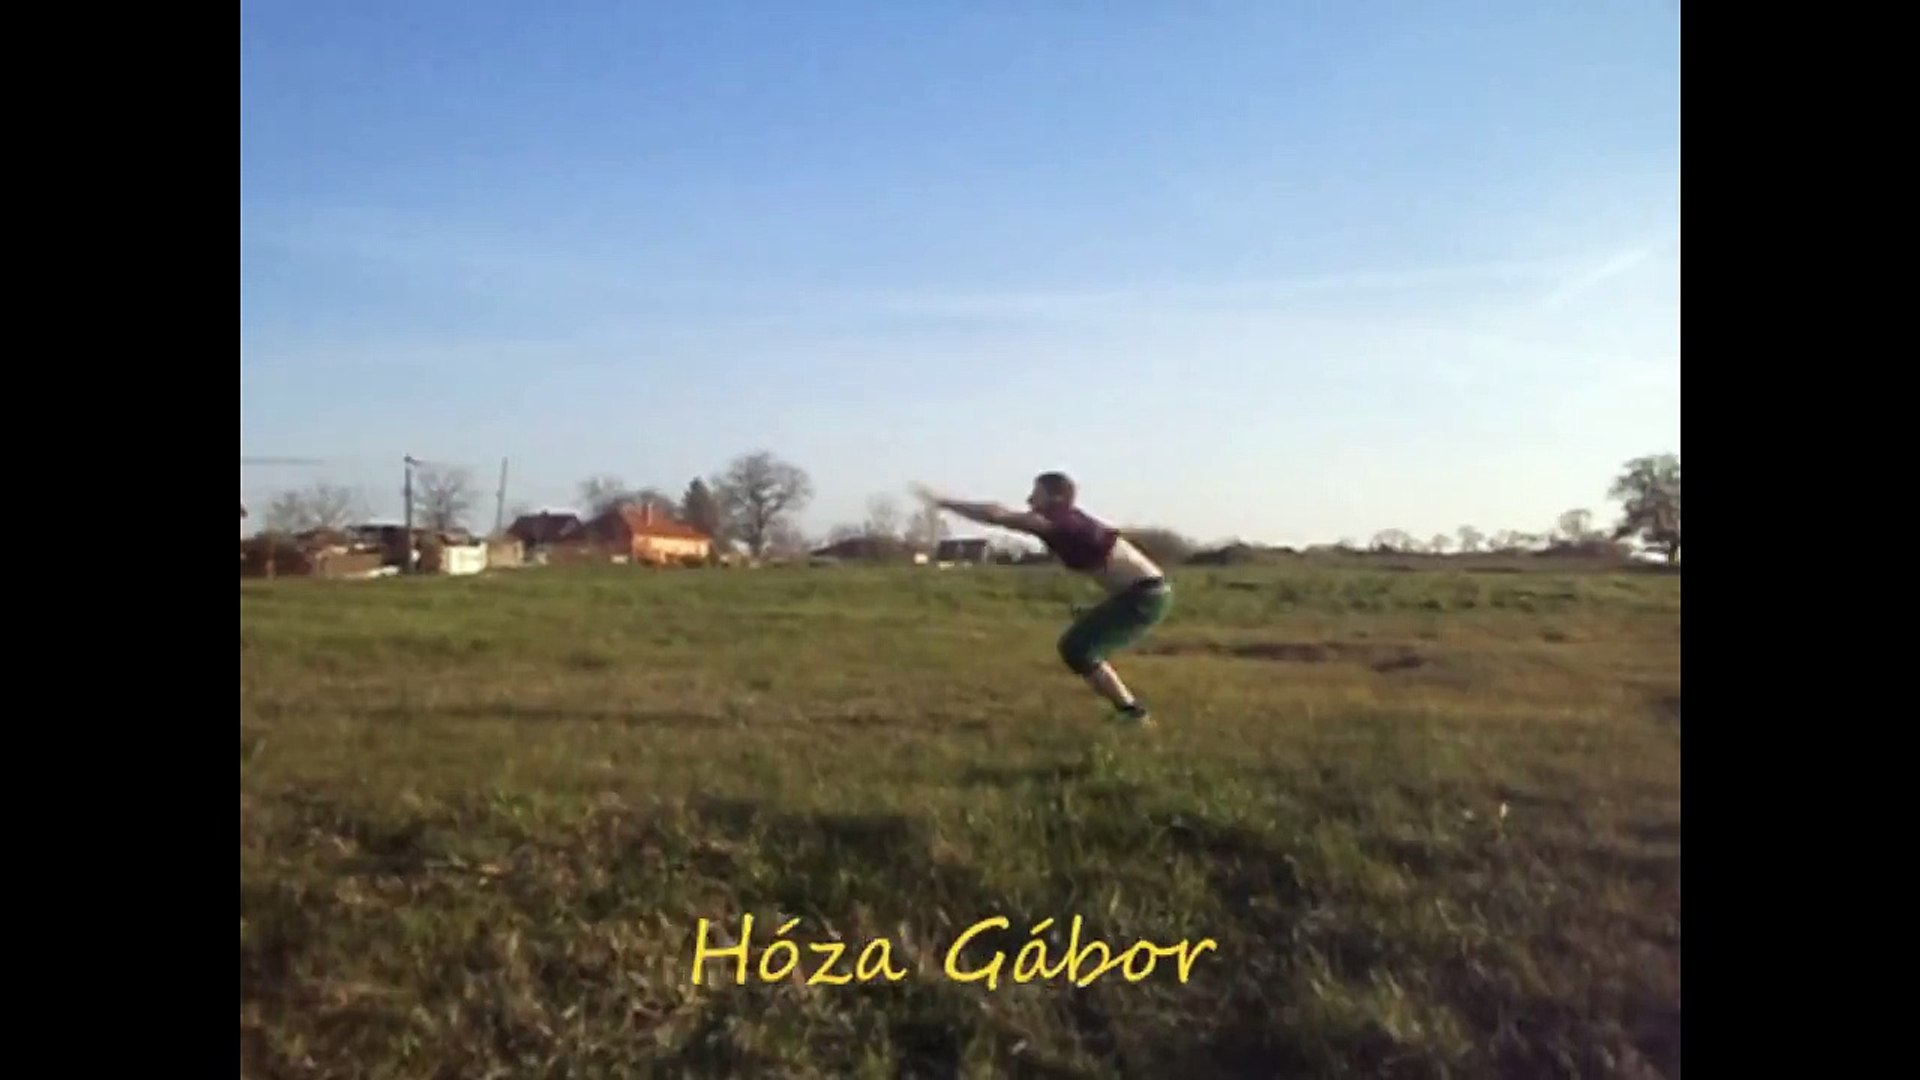 Spring training - Hóza Gábor